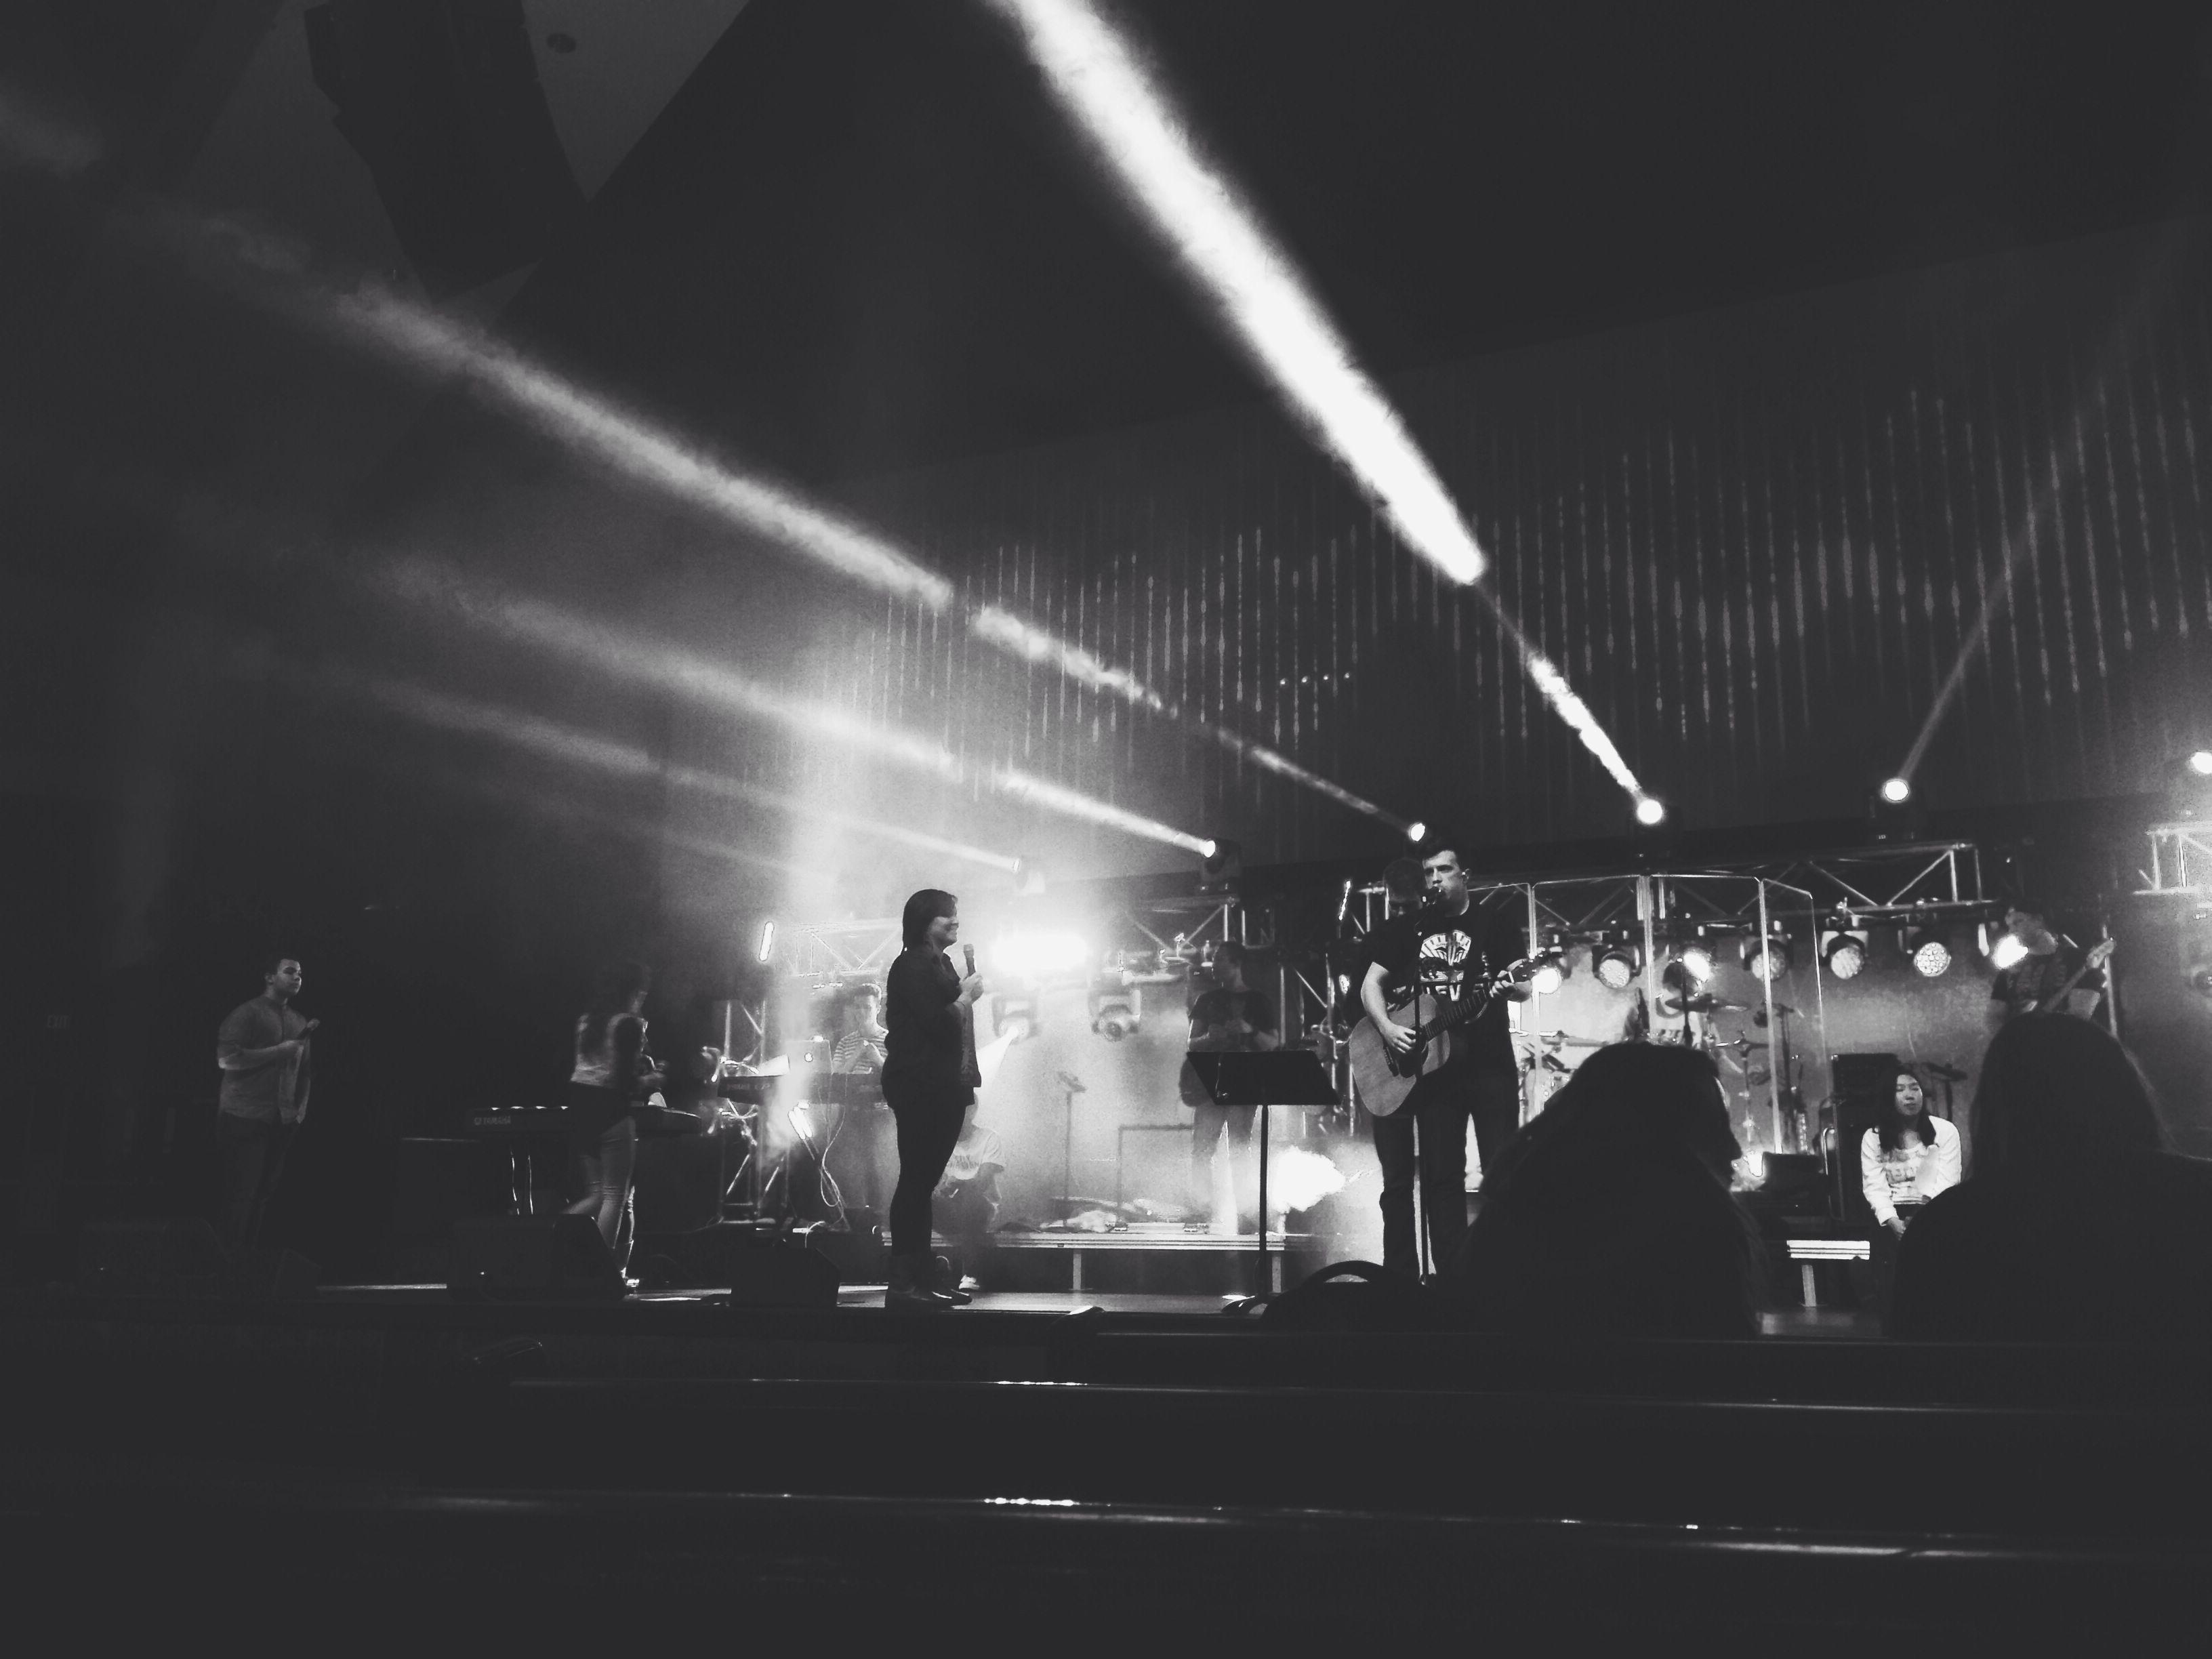 Stage. Lights.